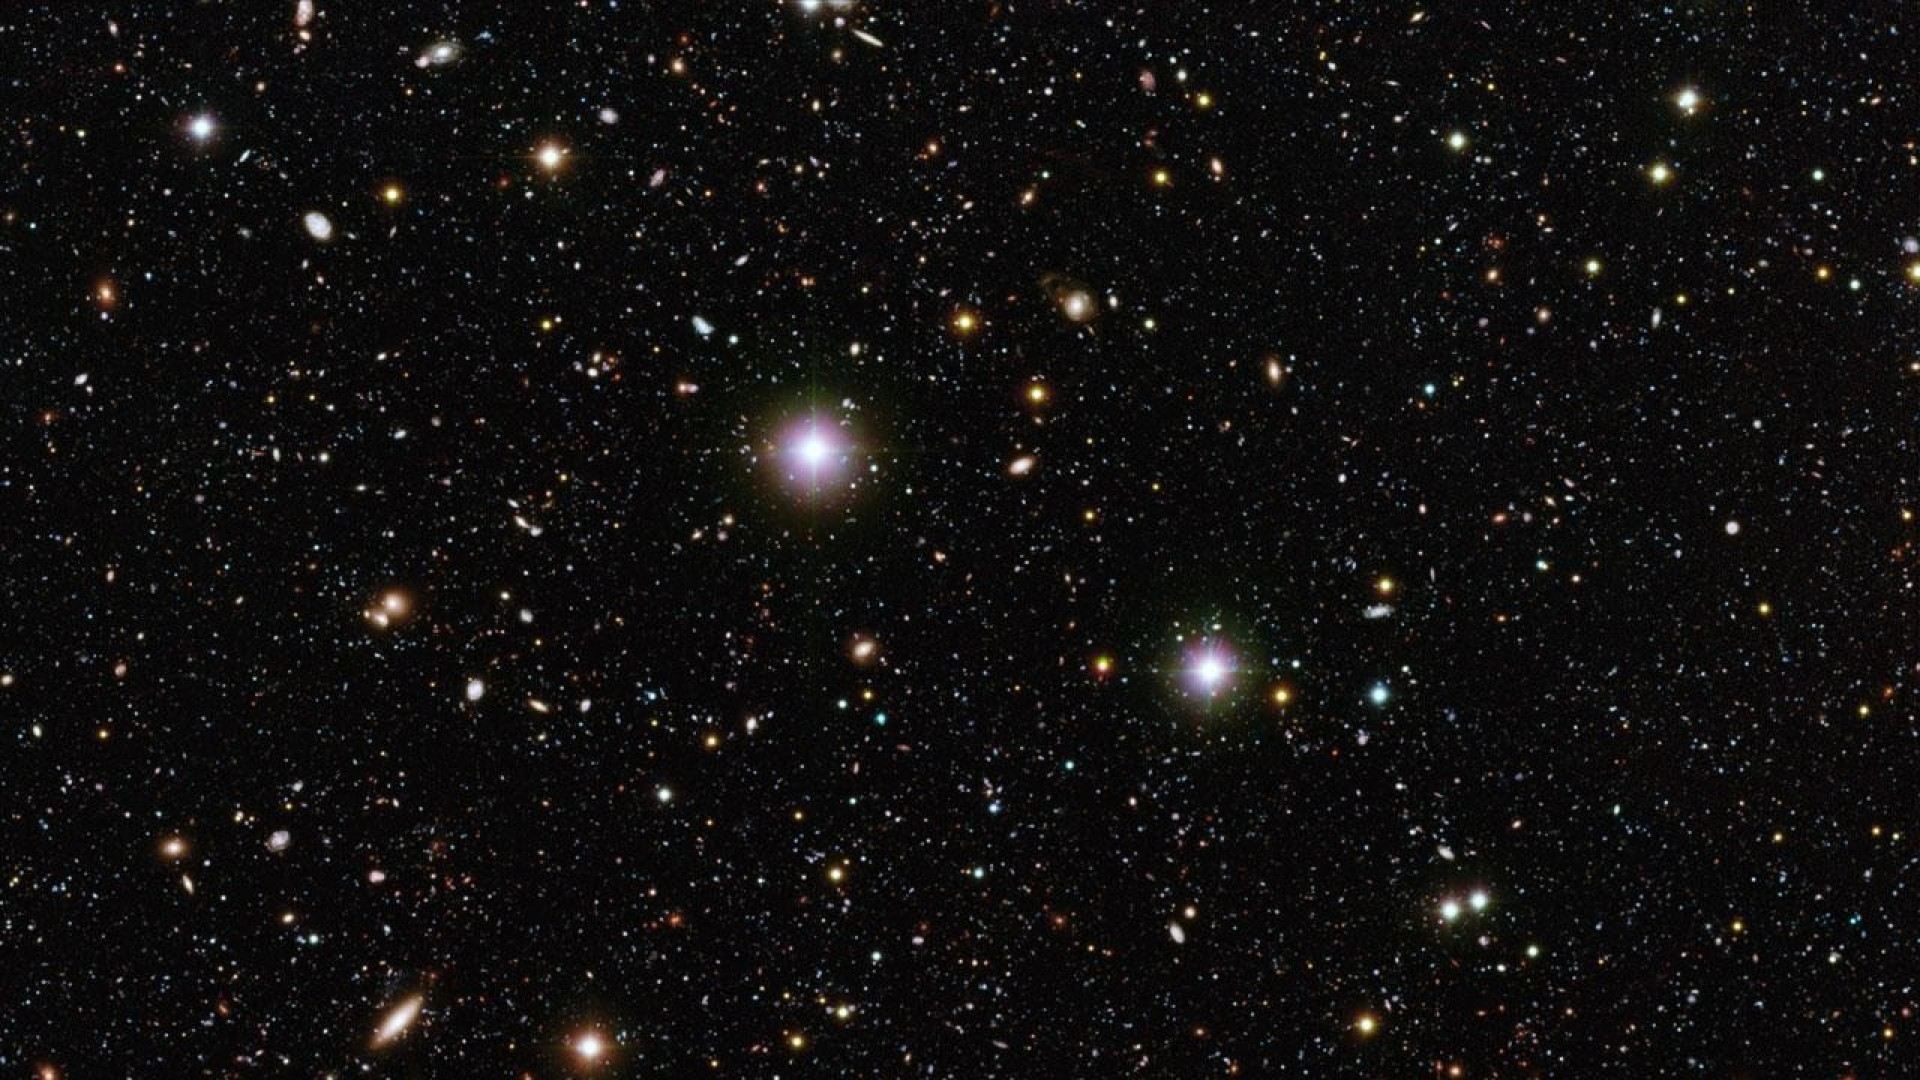 Stars Wallpaper Space #17143 Wallpaper | High Resolution Wallarthd.com